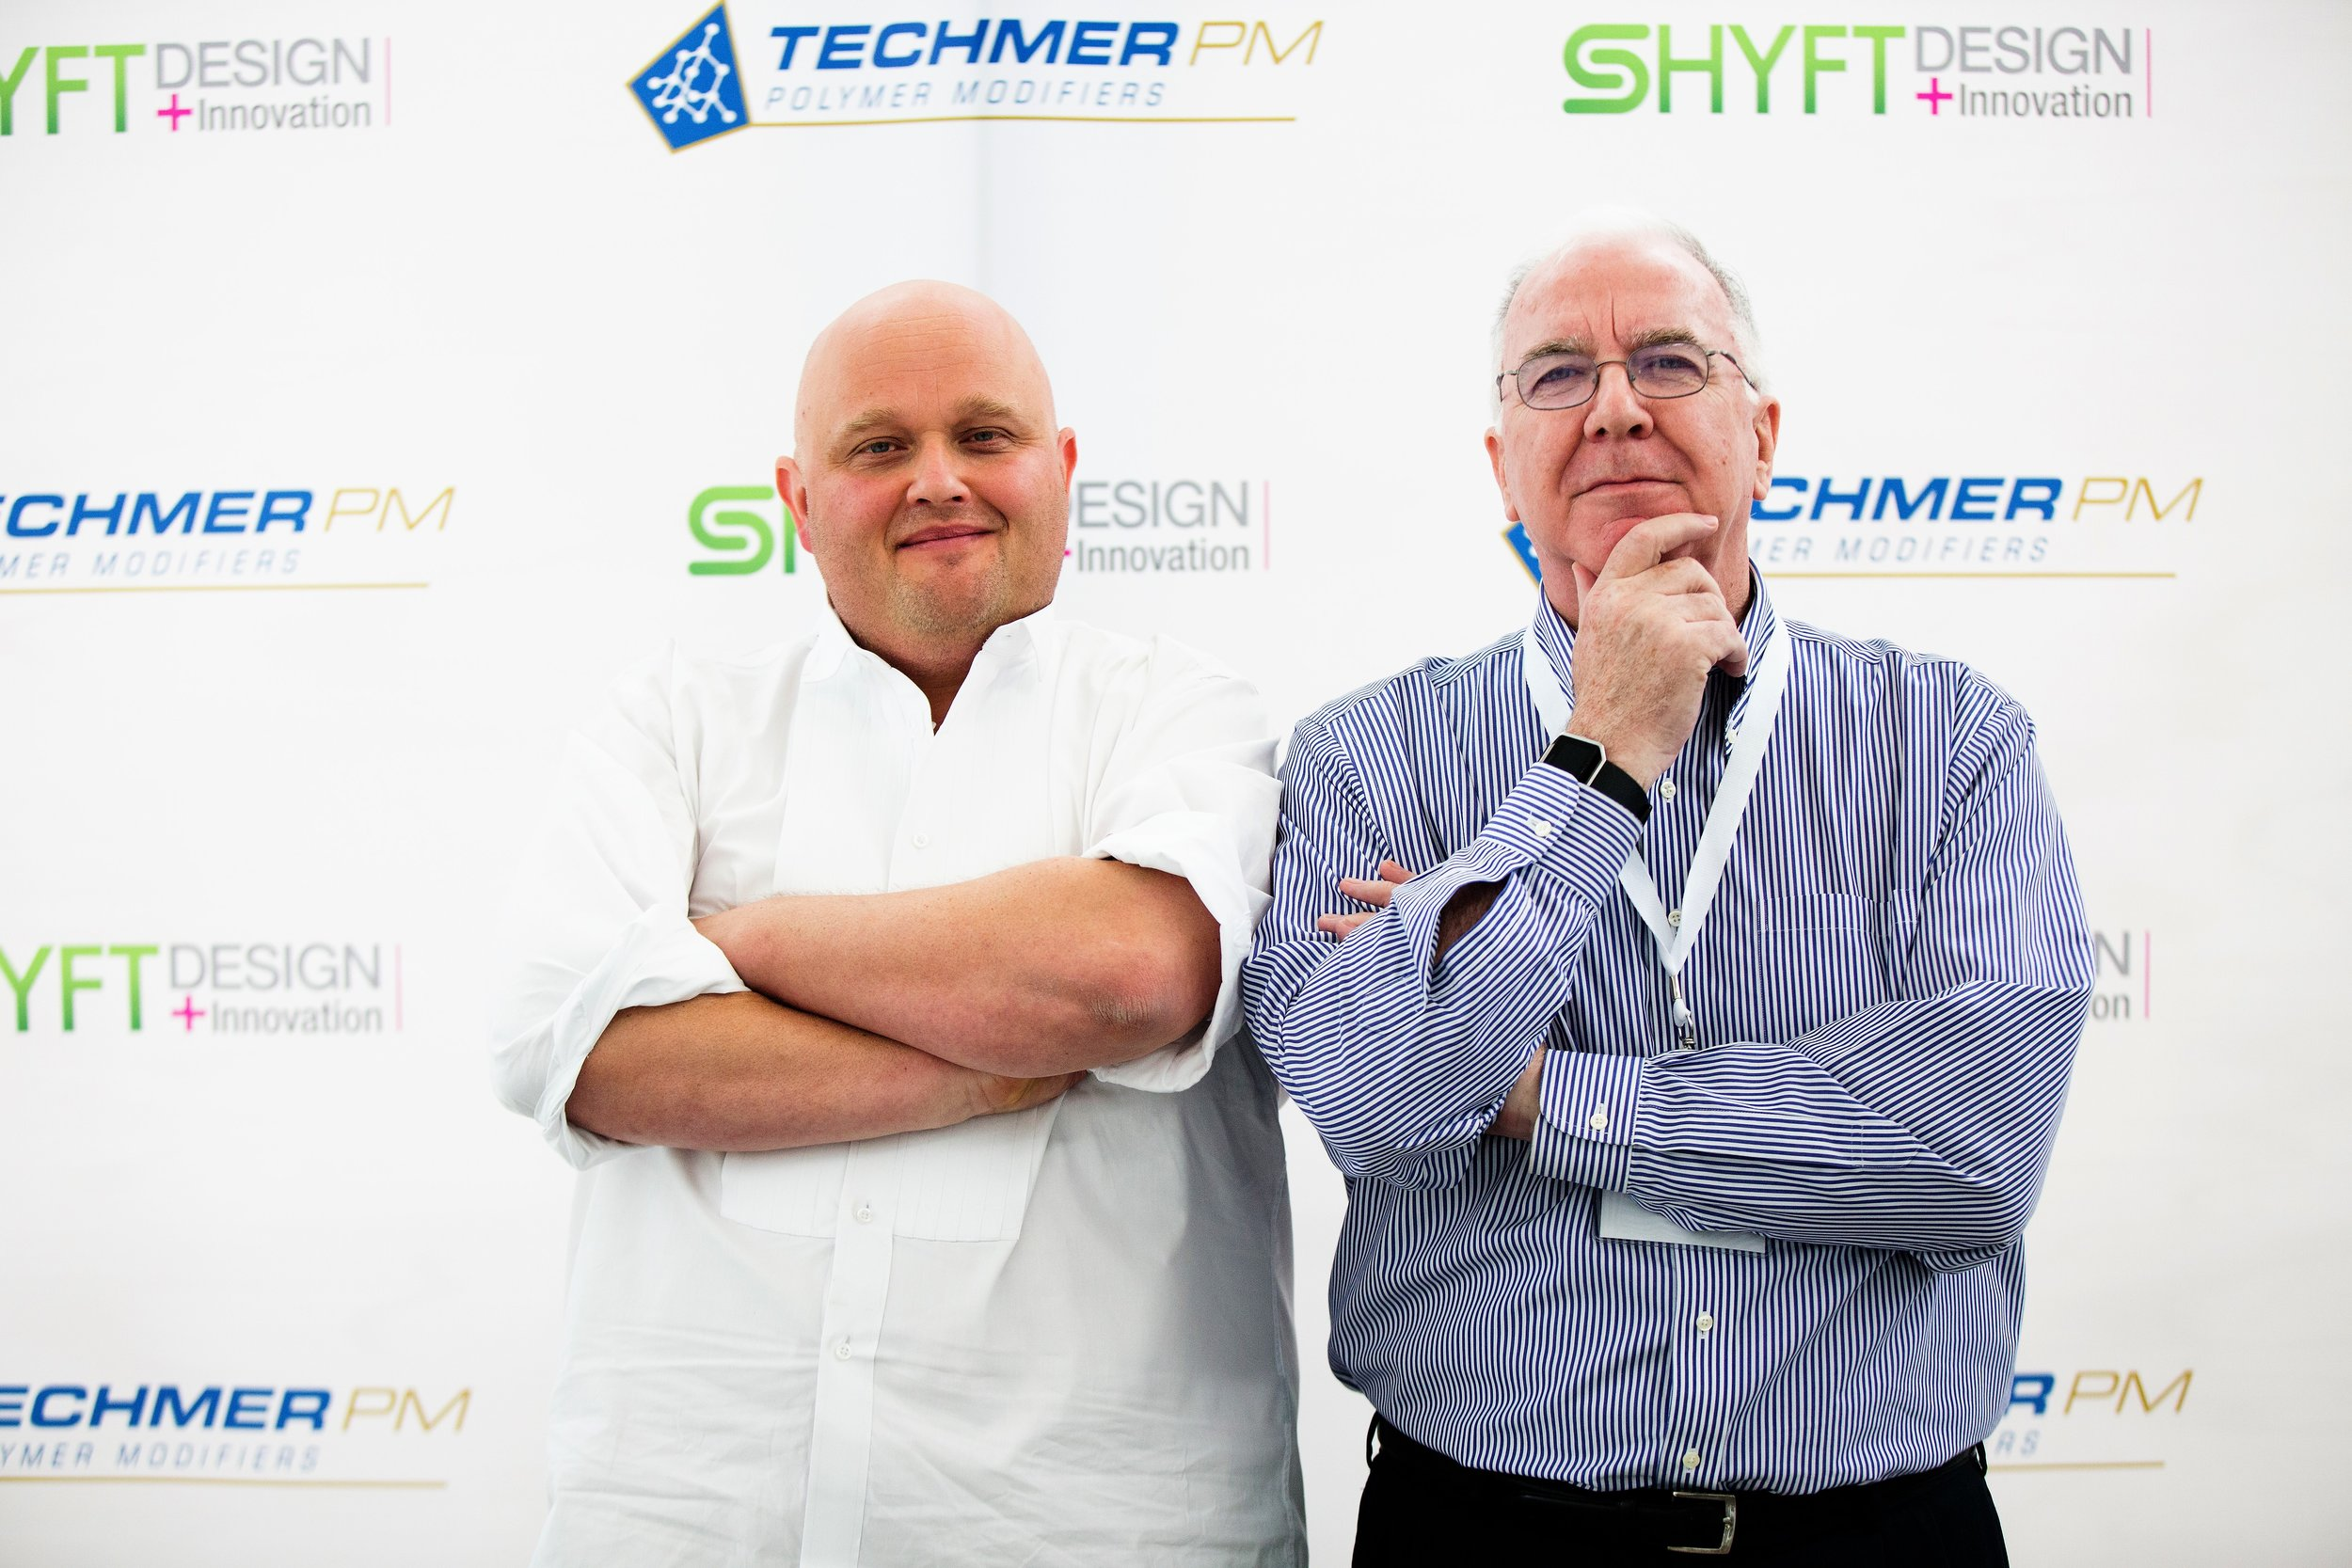 Marc Shillum and David Turner